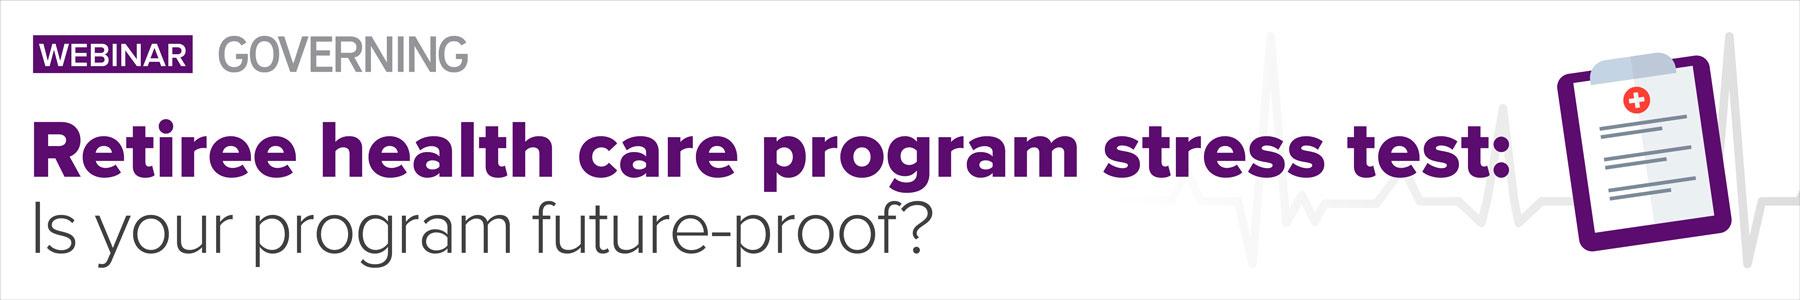 Retiree health care program stress test: Is your program future-proof?